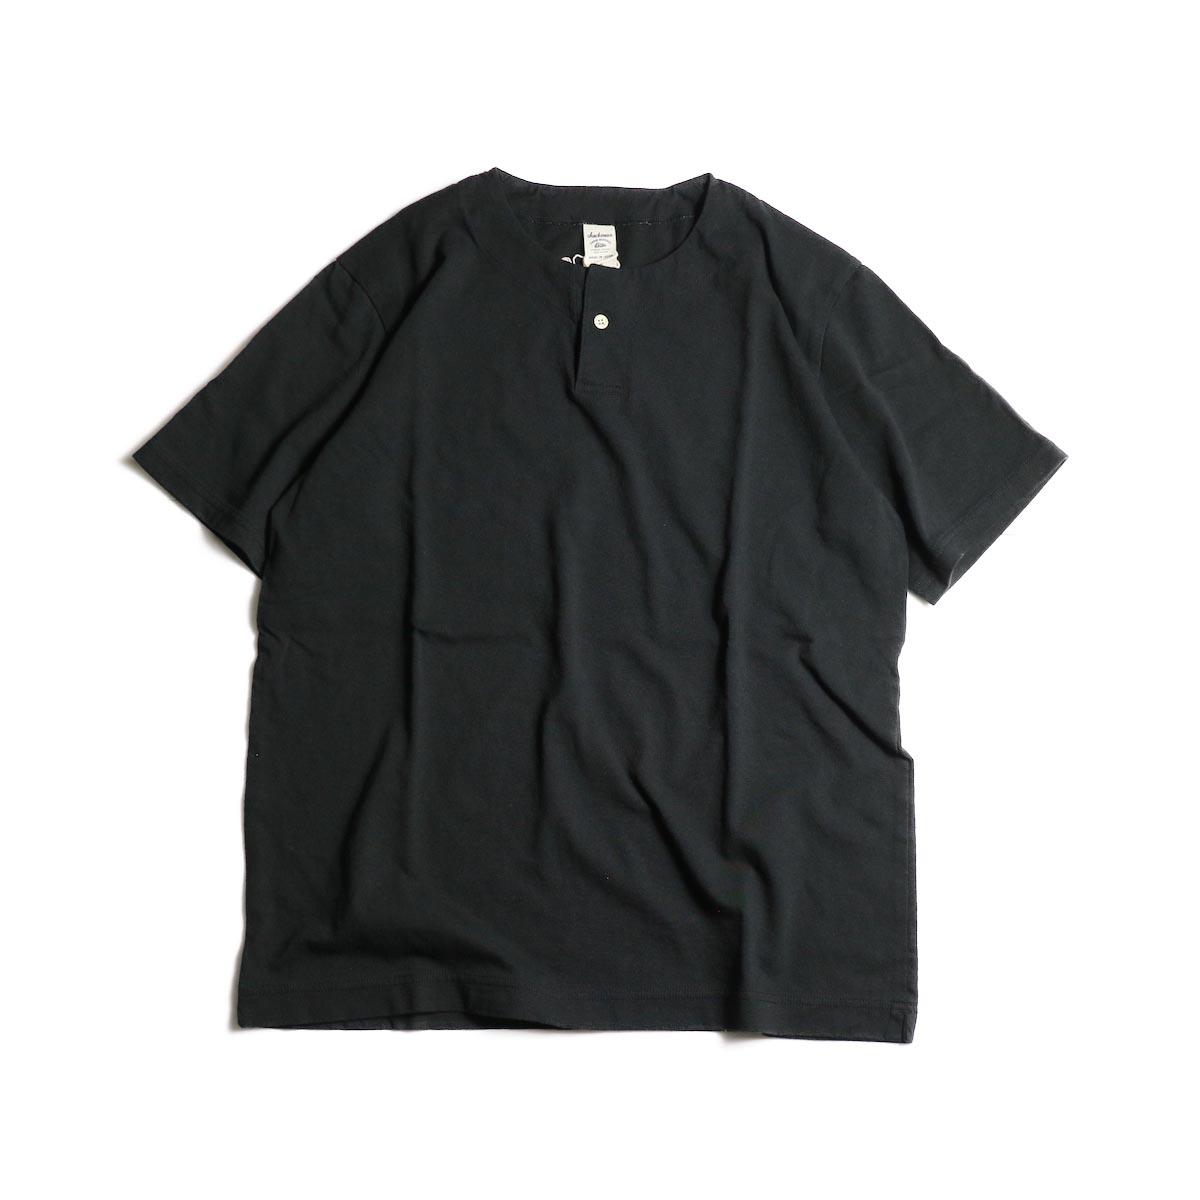 Jackman / Henley neck T-Shirt (Black)